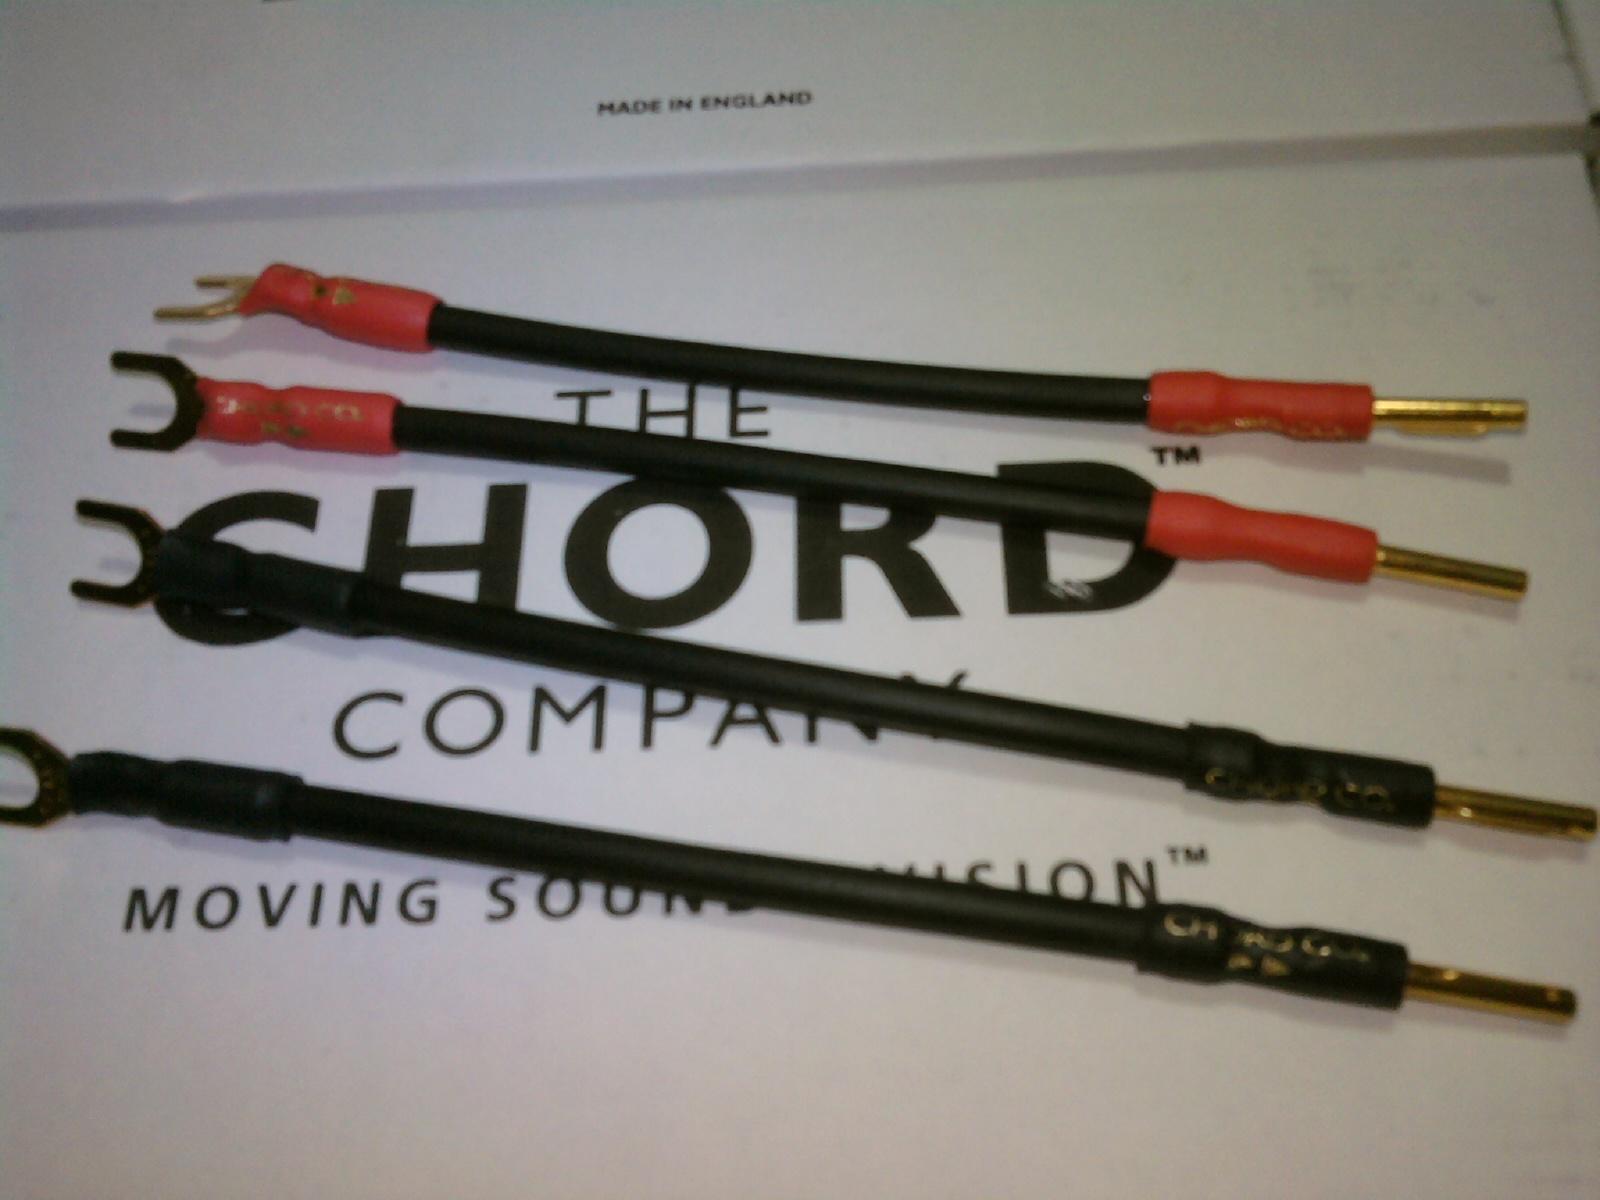 Chord company signature jumper set of 4(new) Chord%20Signature%20Jumpers-0005